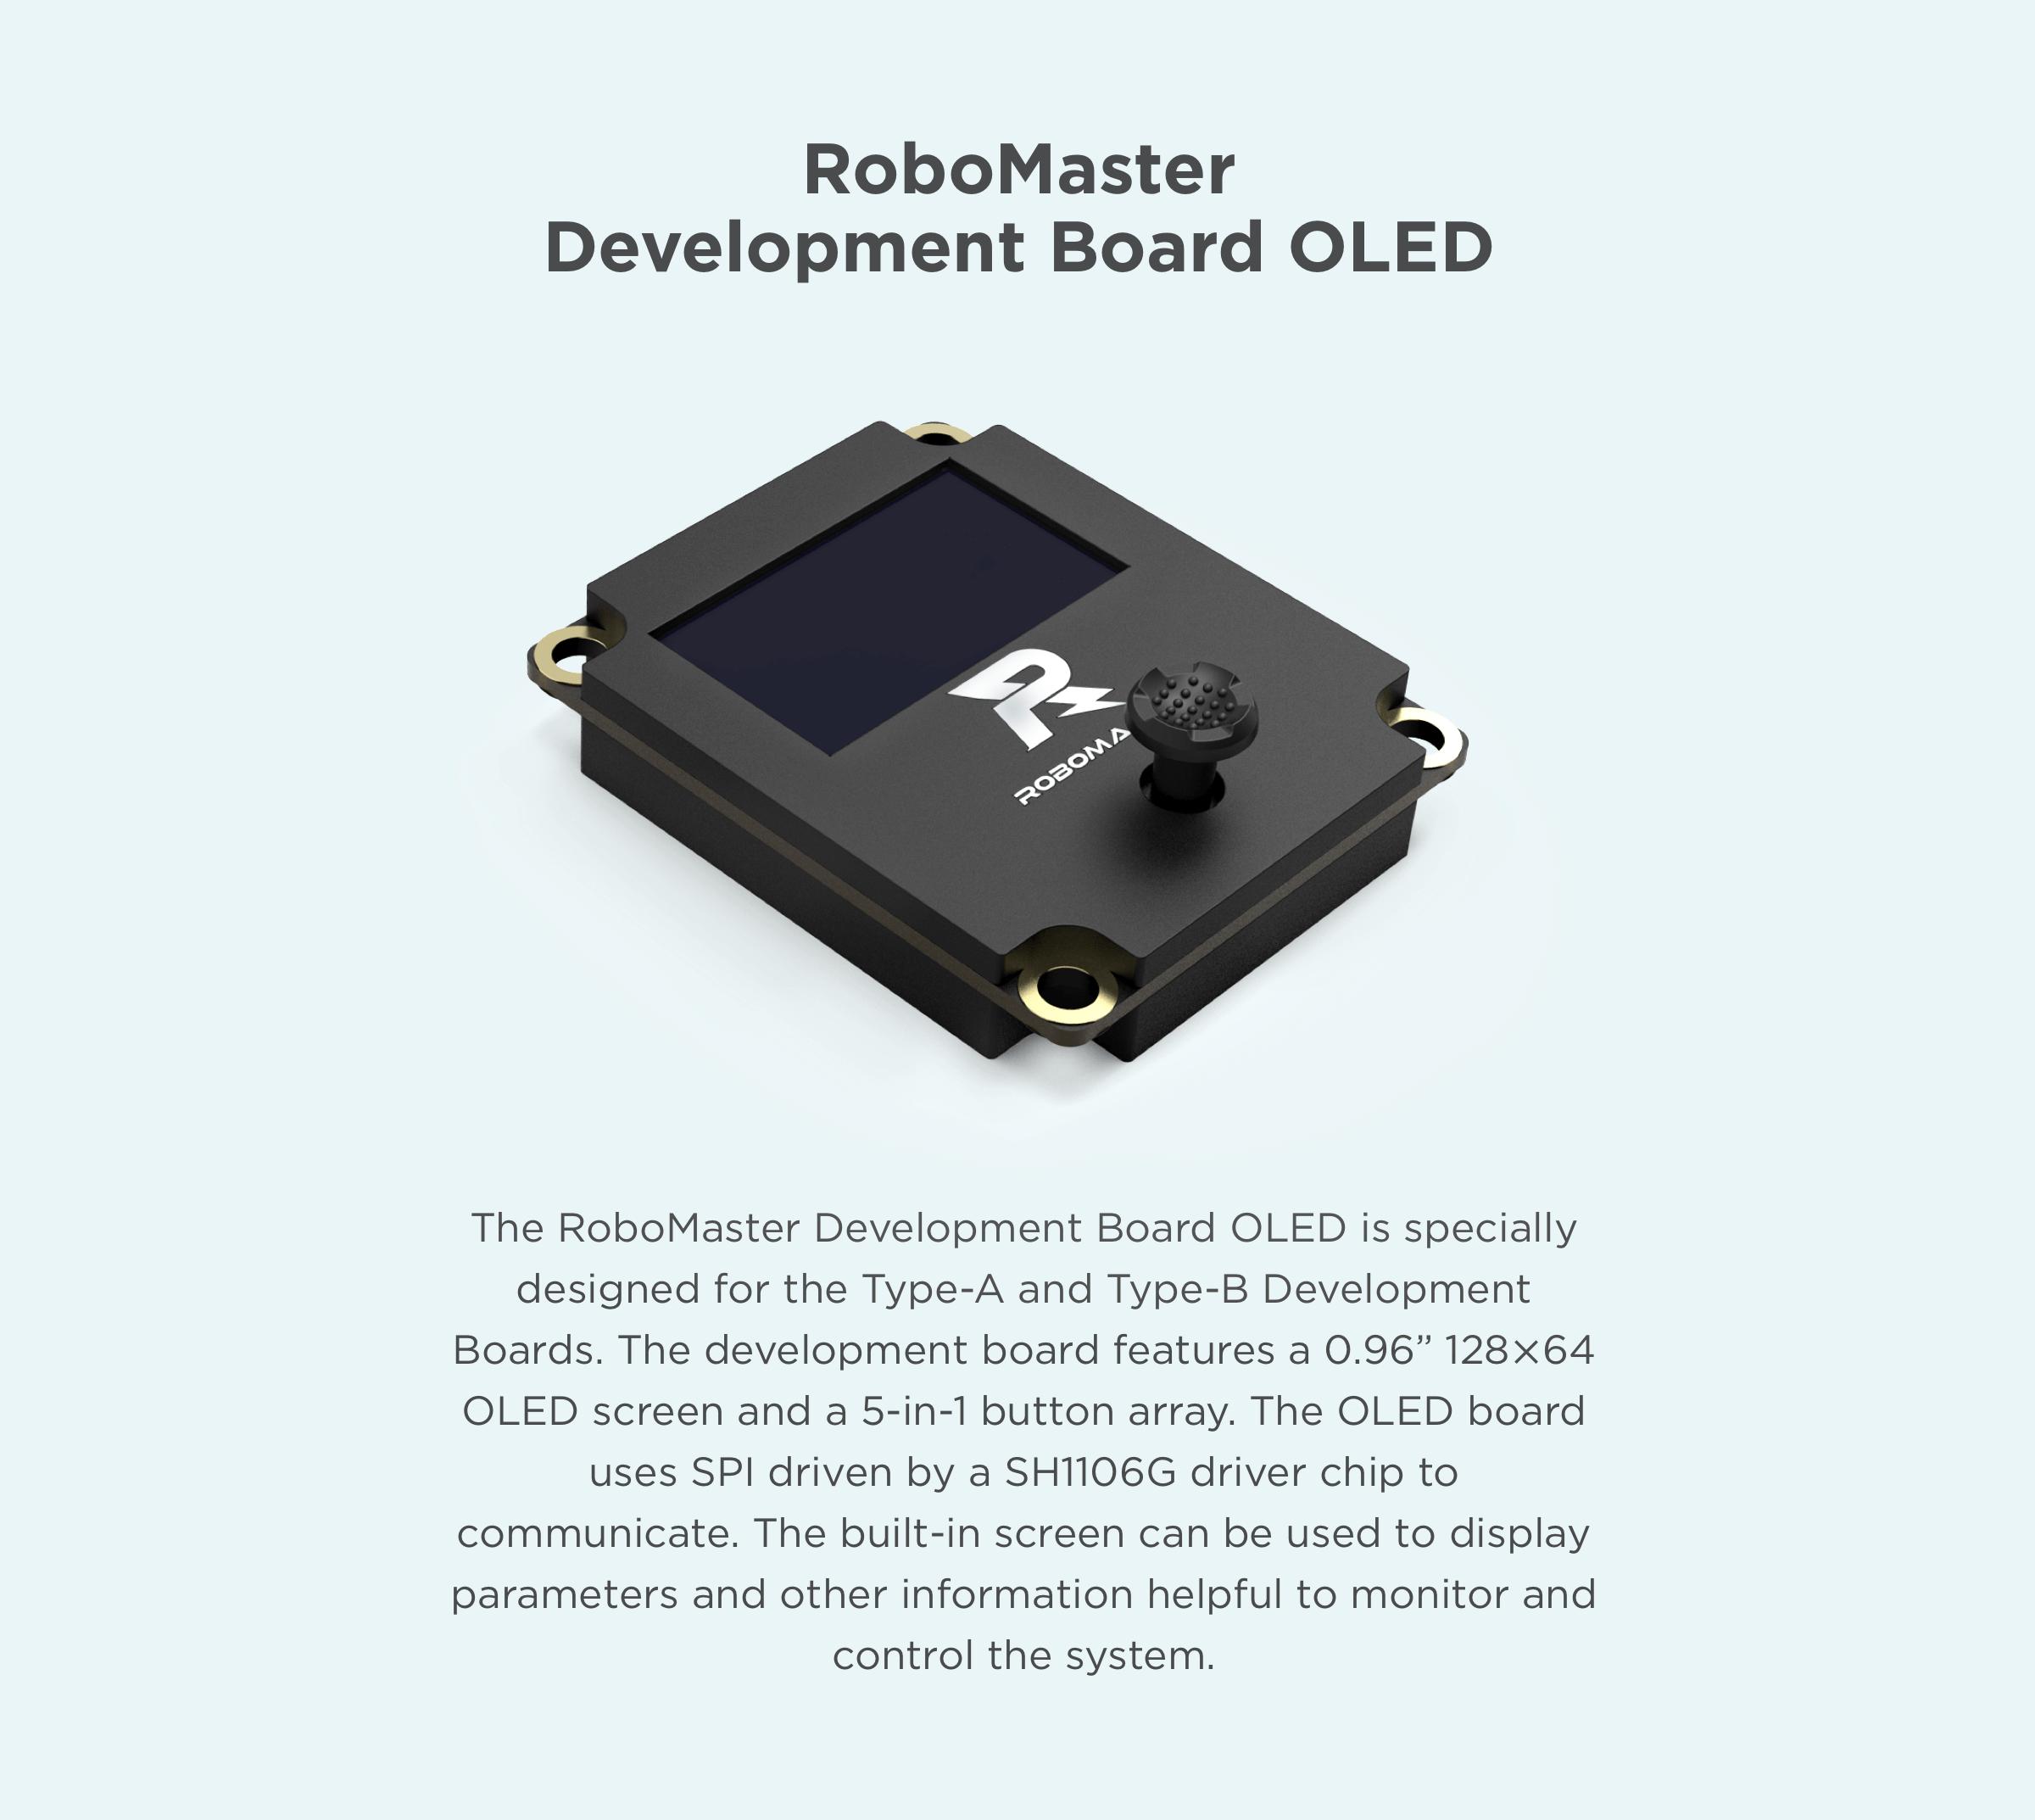 Development Board OLED